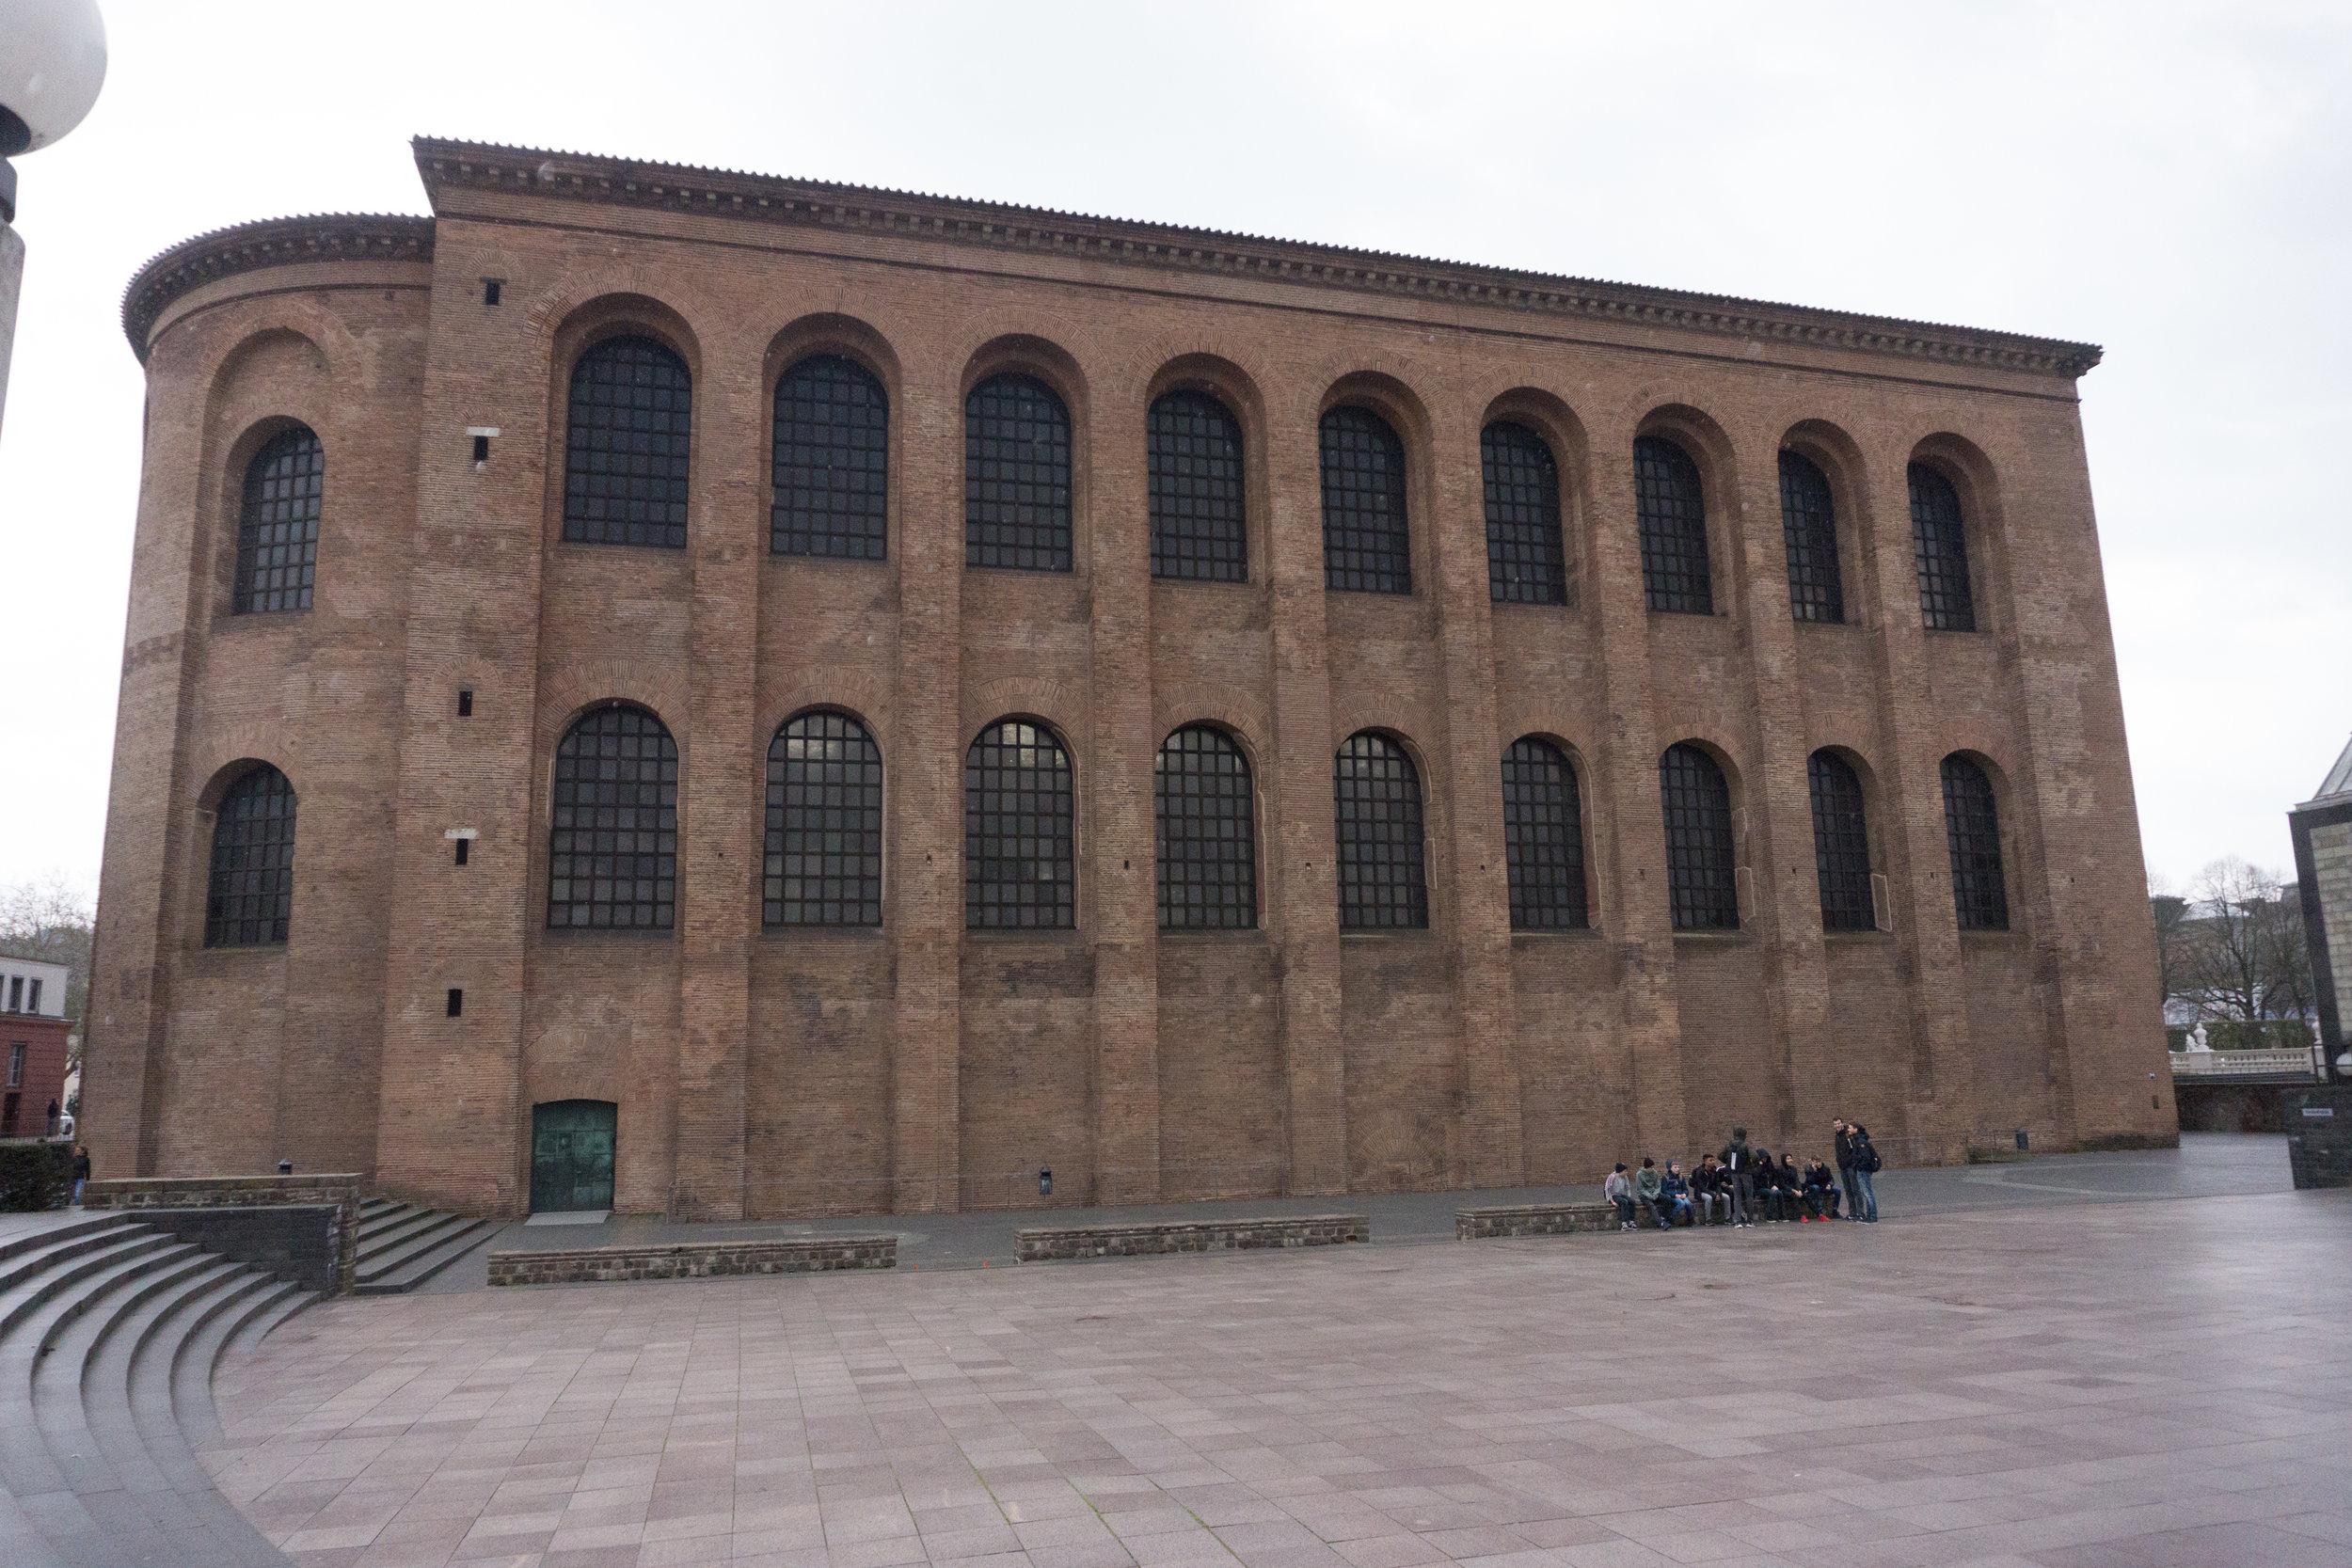 Constantinian Basilica 4th century Imperial Throne Room